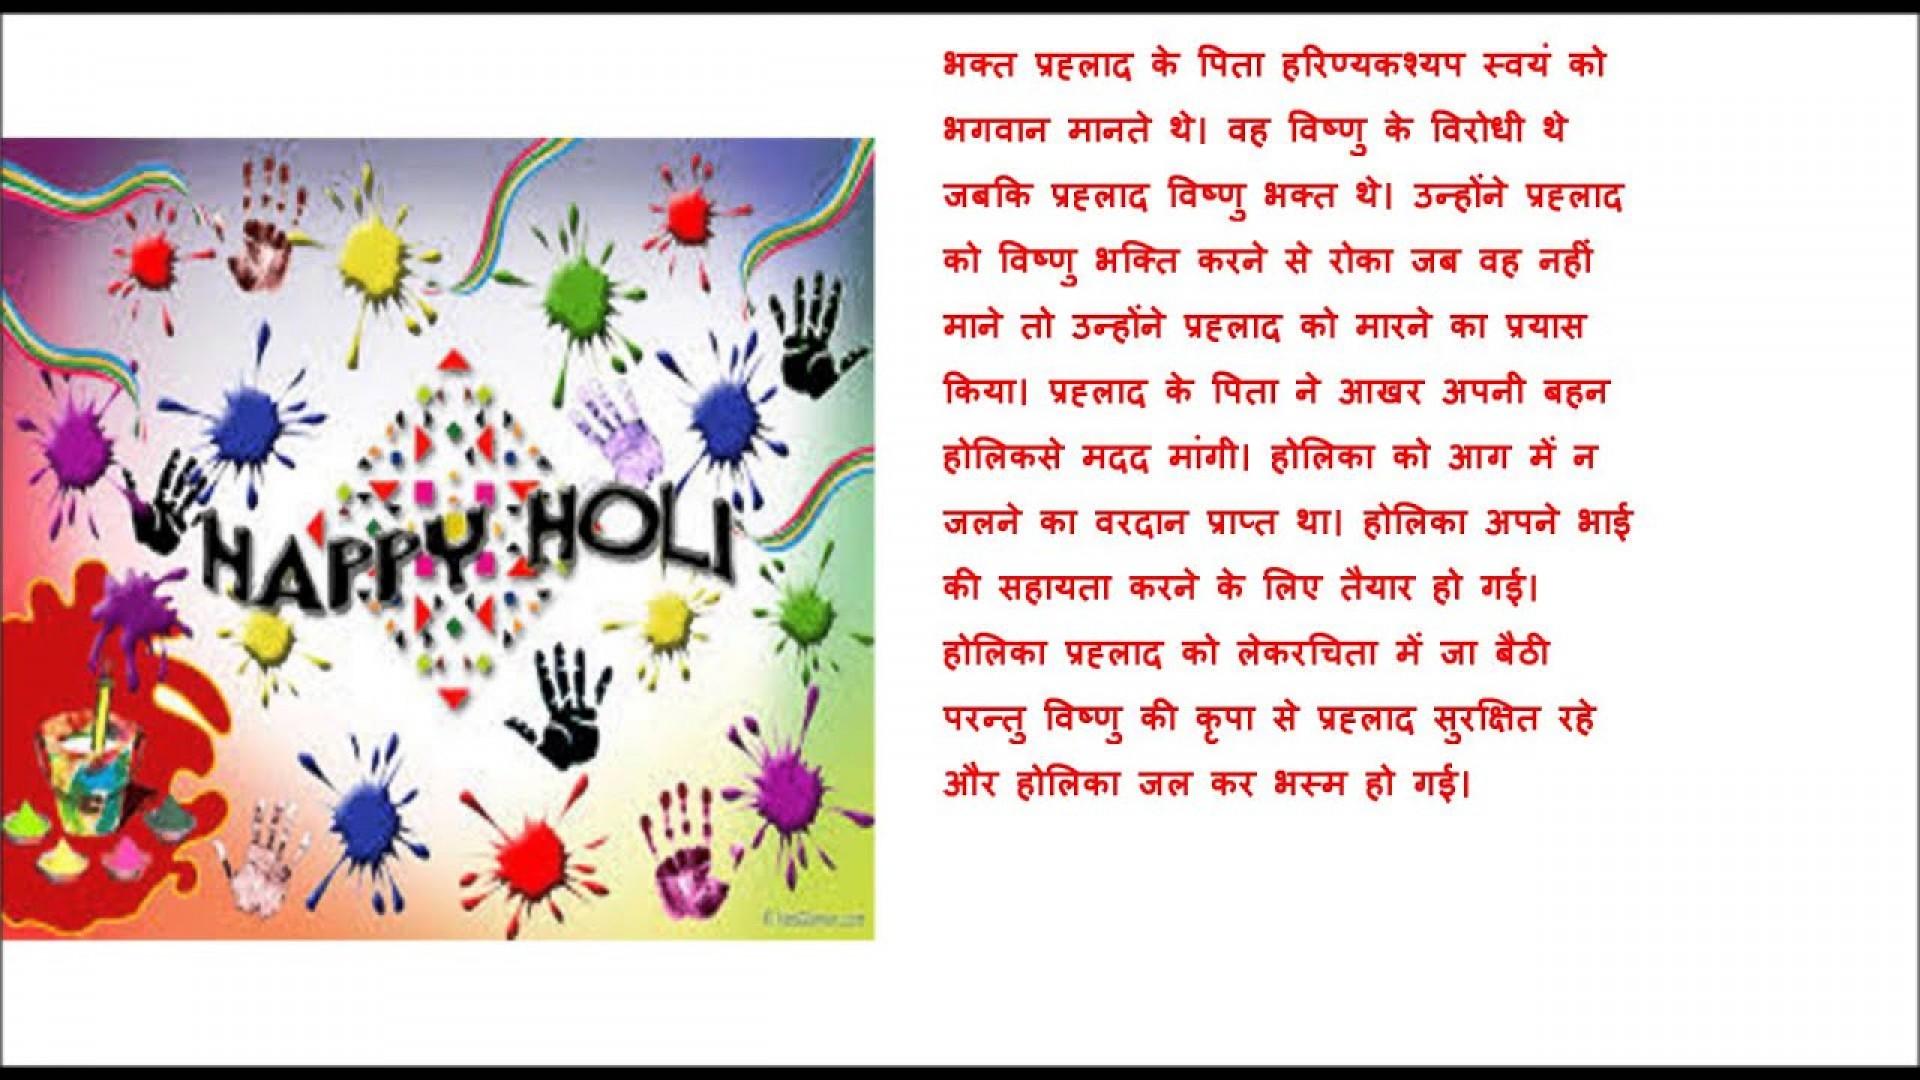 007 Essay Example Holi Festival Top In Punjabi 1920